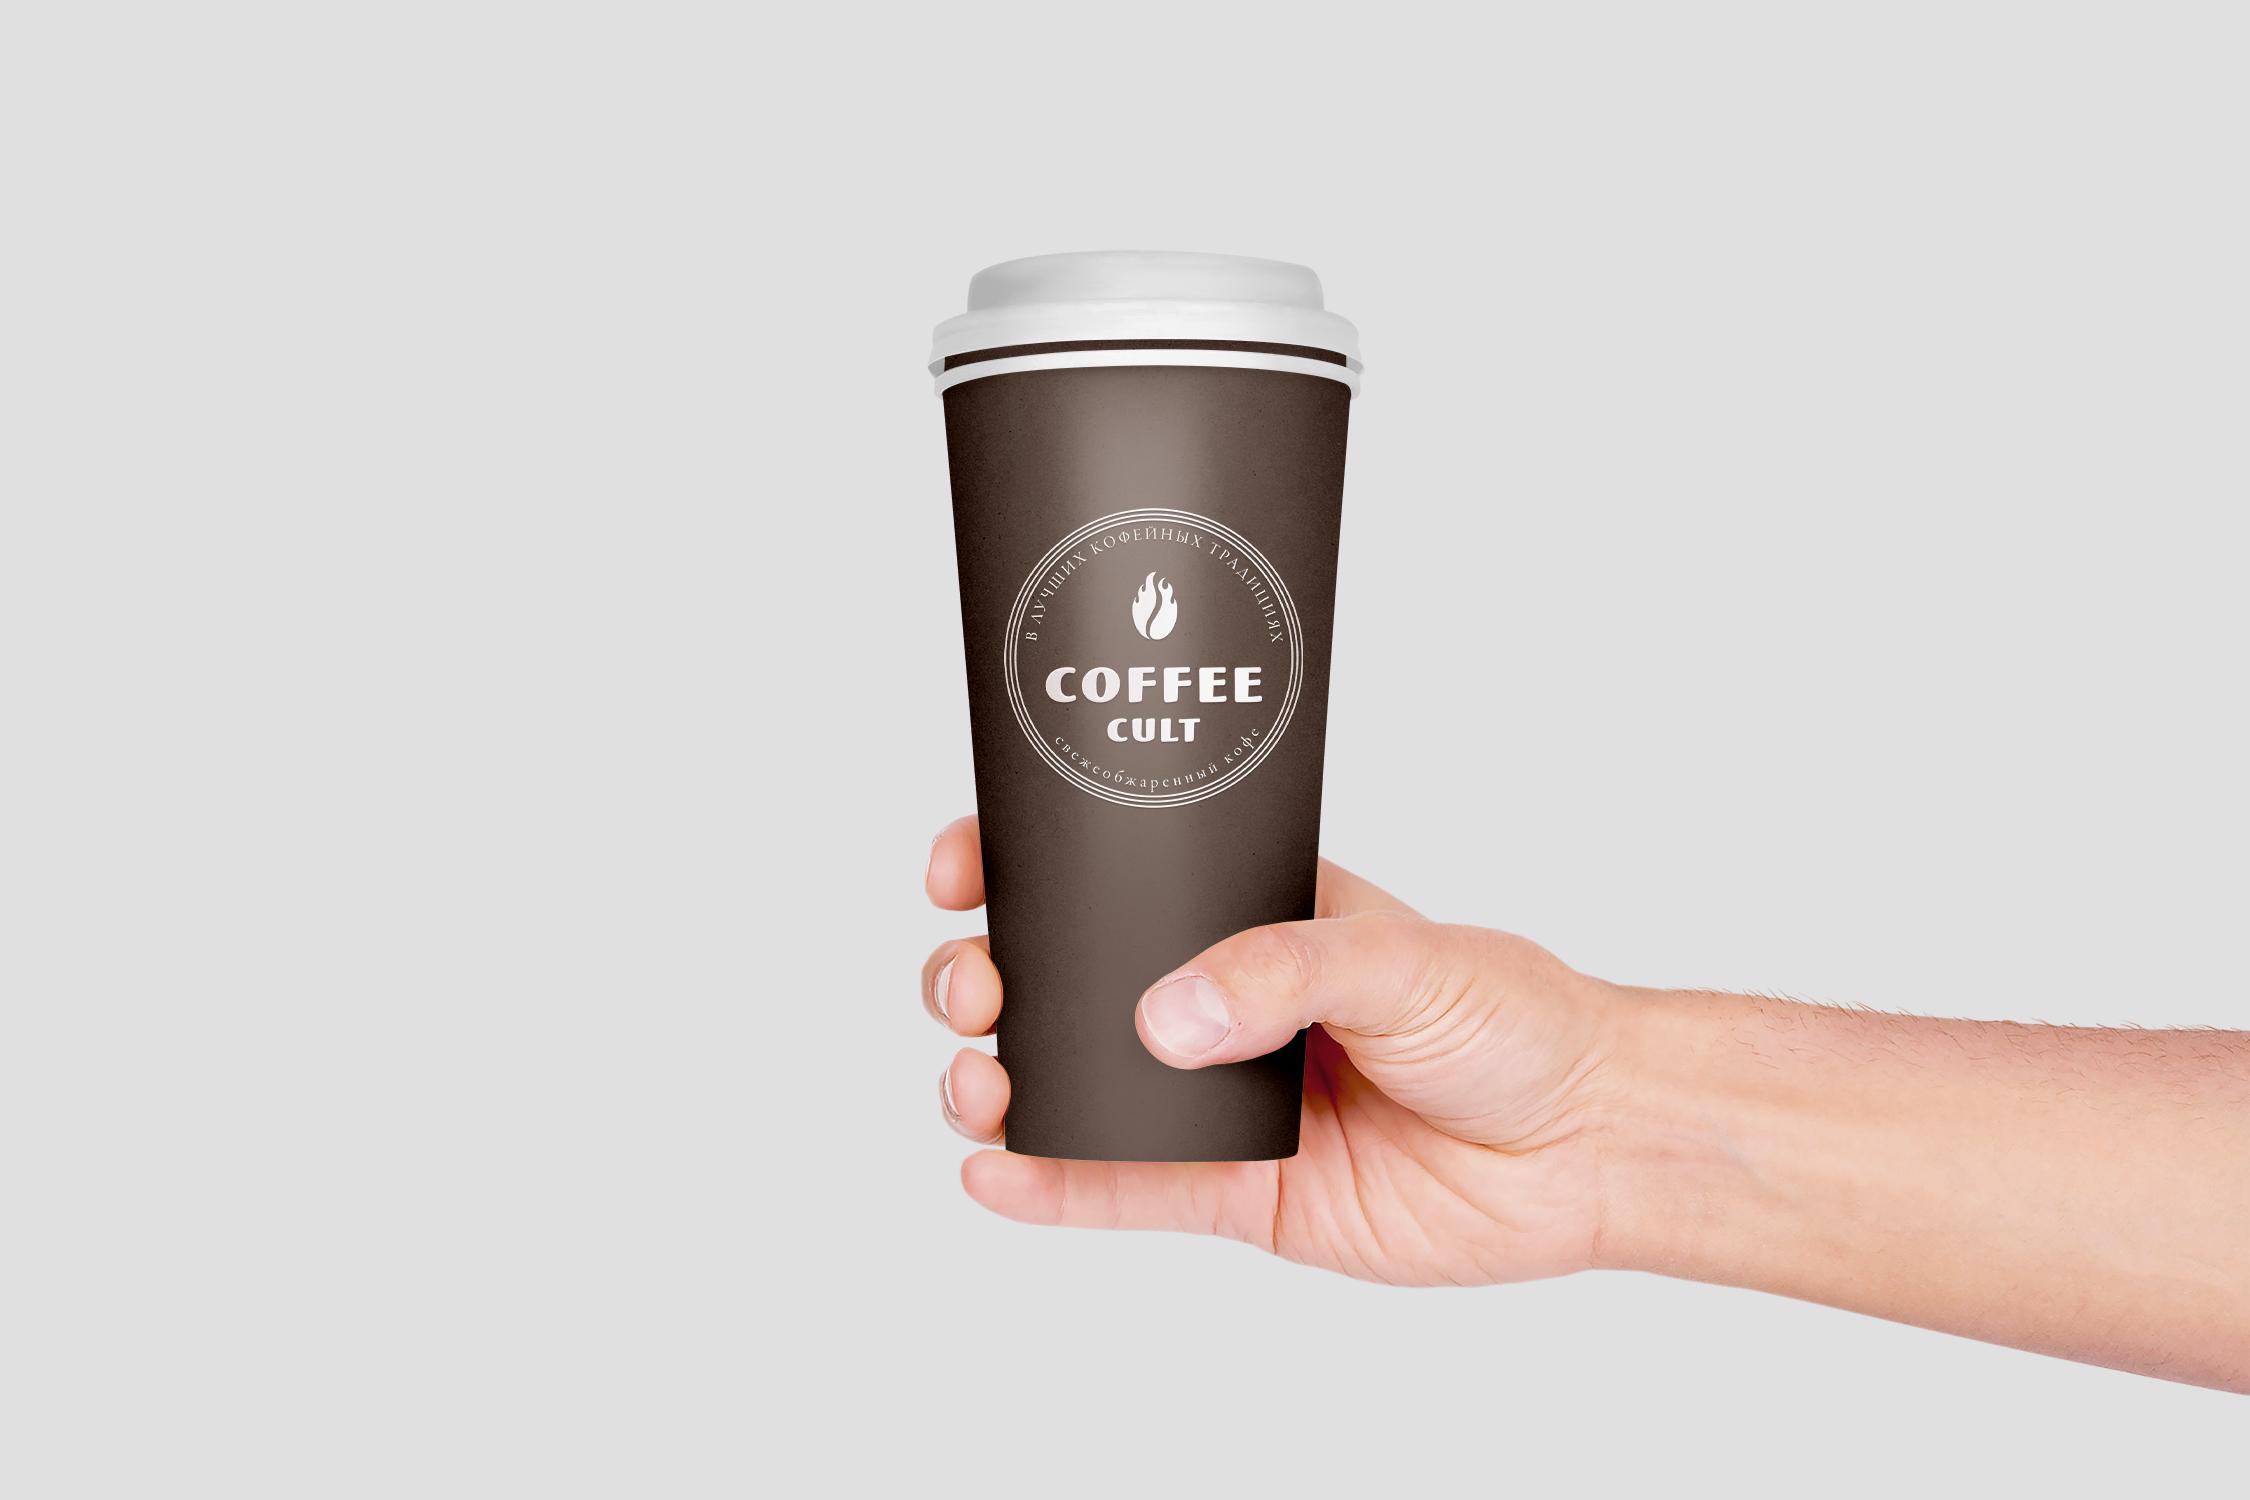 Логотип и фирменный стиль для компании COFFEE CULT фото f_6715bc48cdf6b8e0.jpg